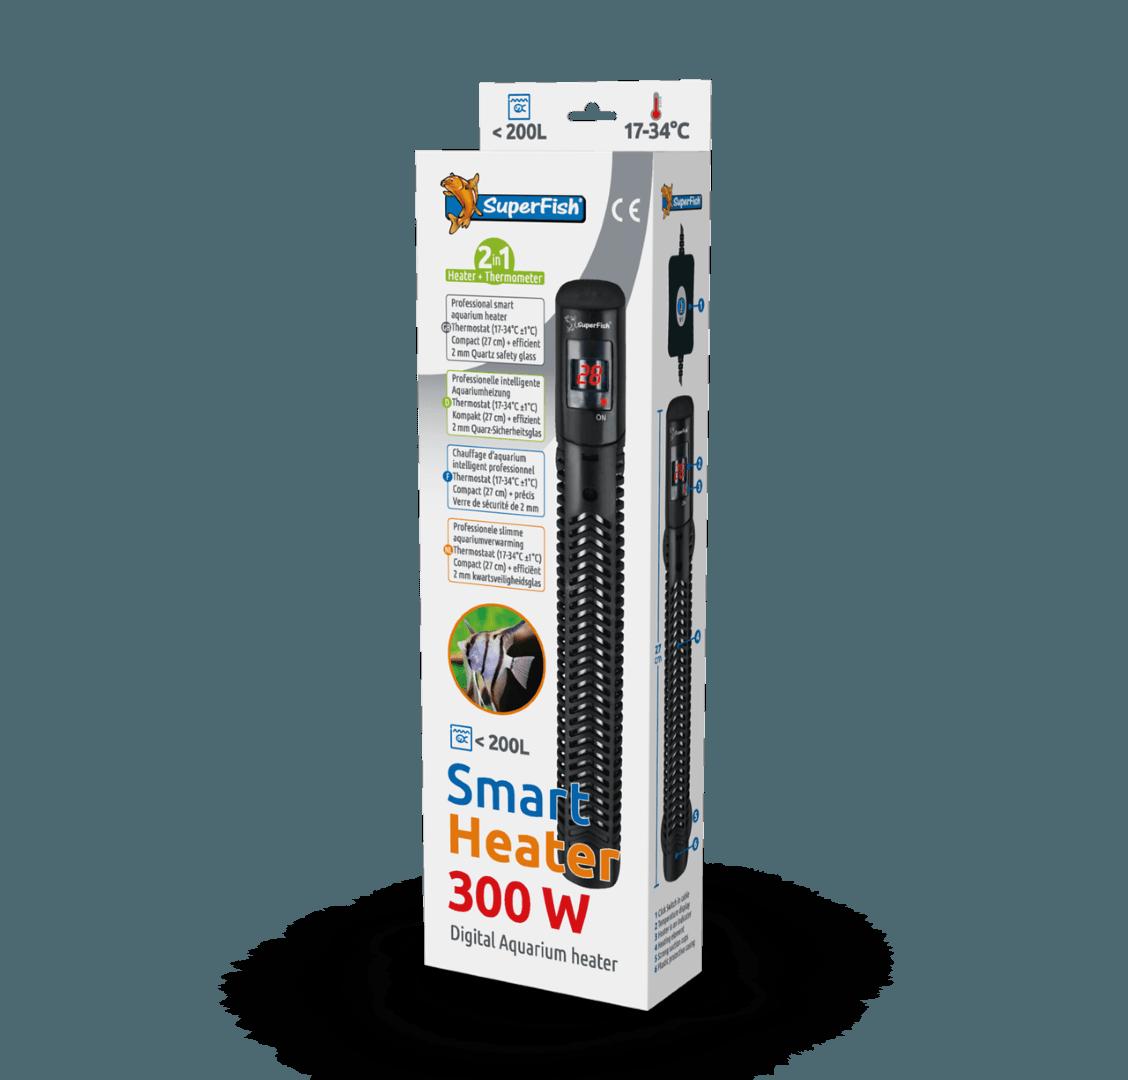 Superfish smart heater 300 watt